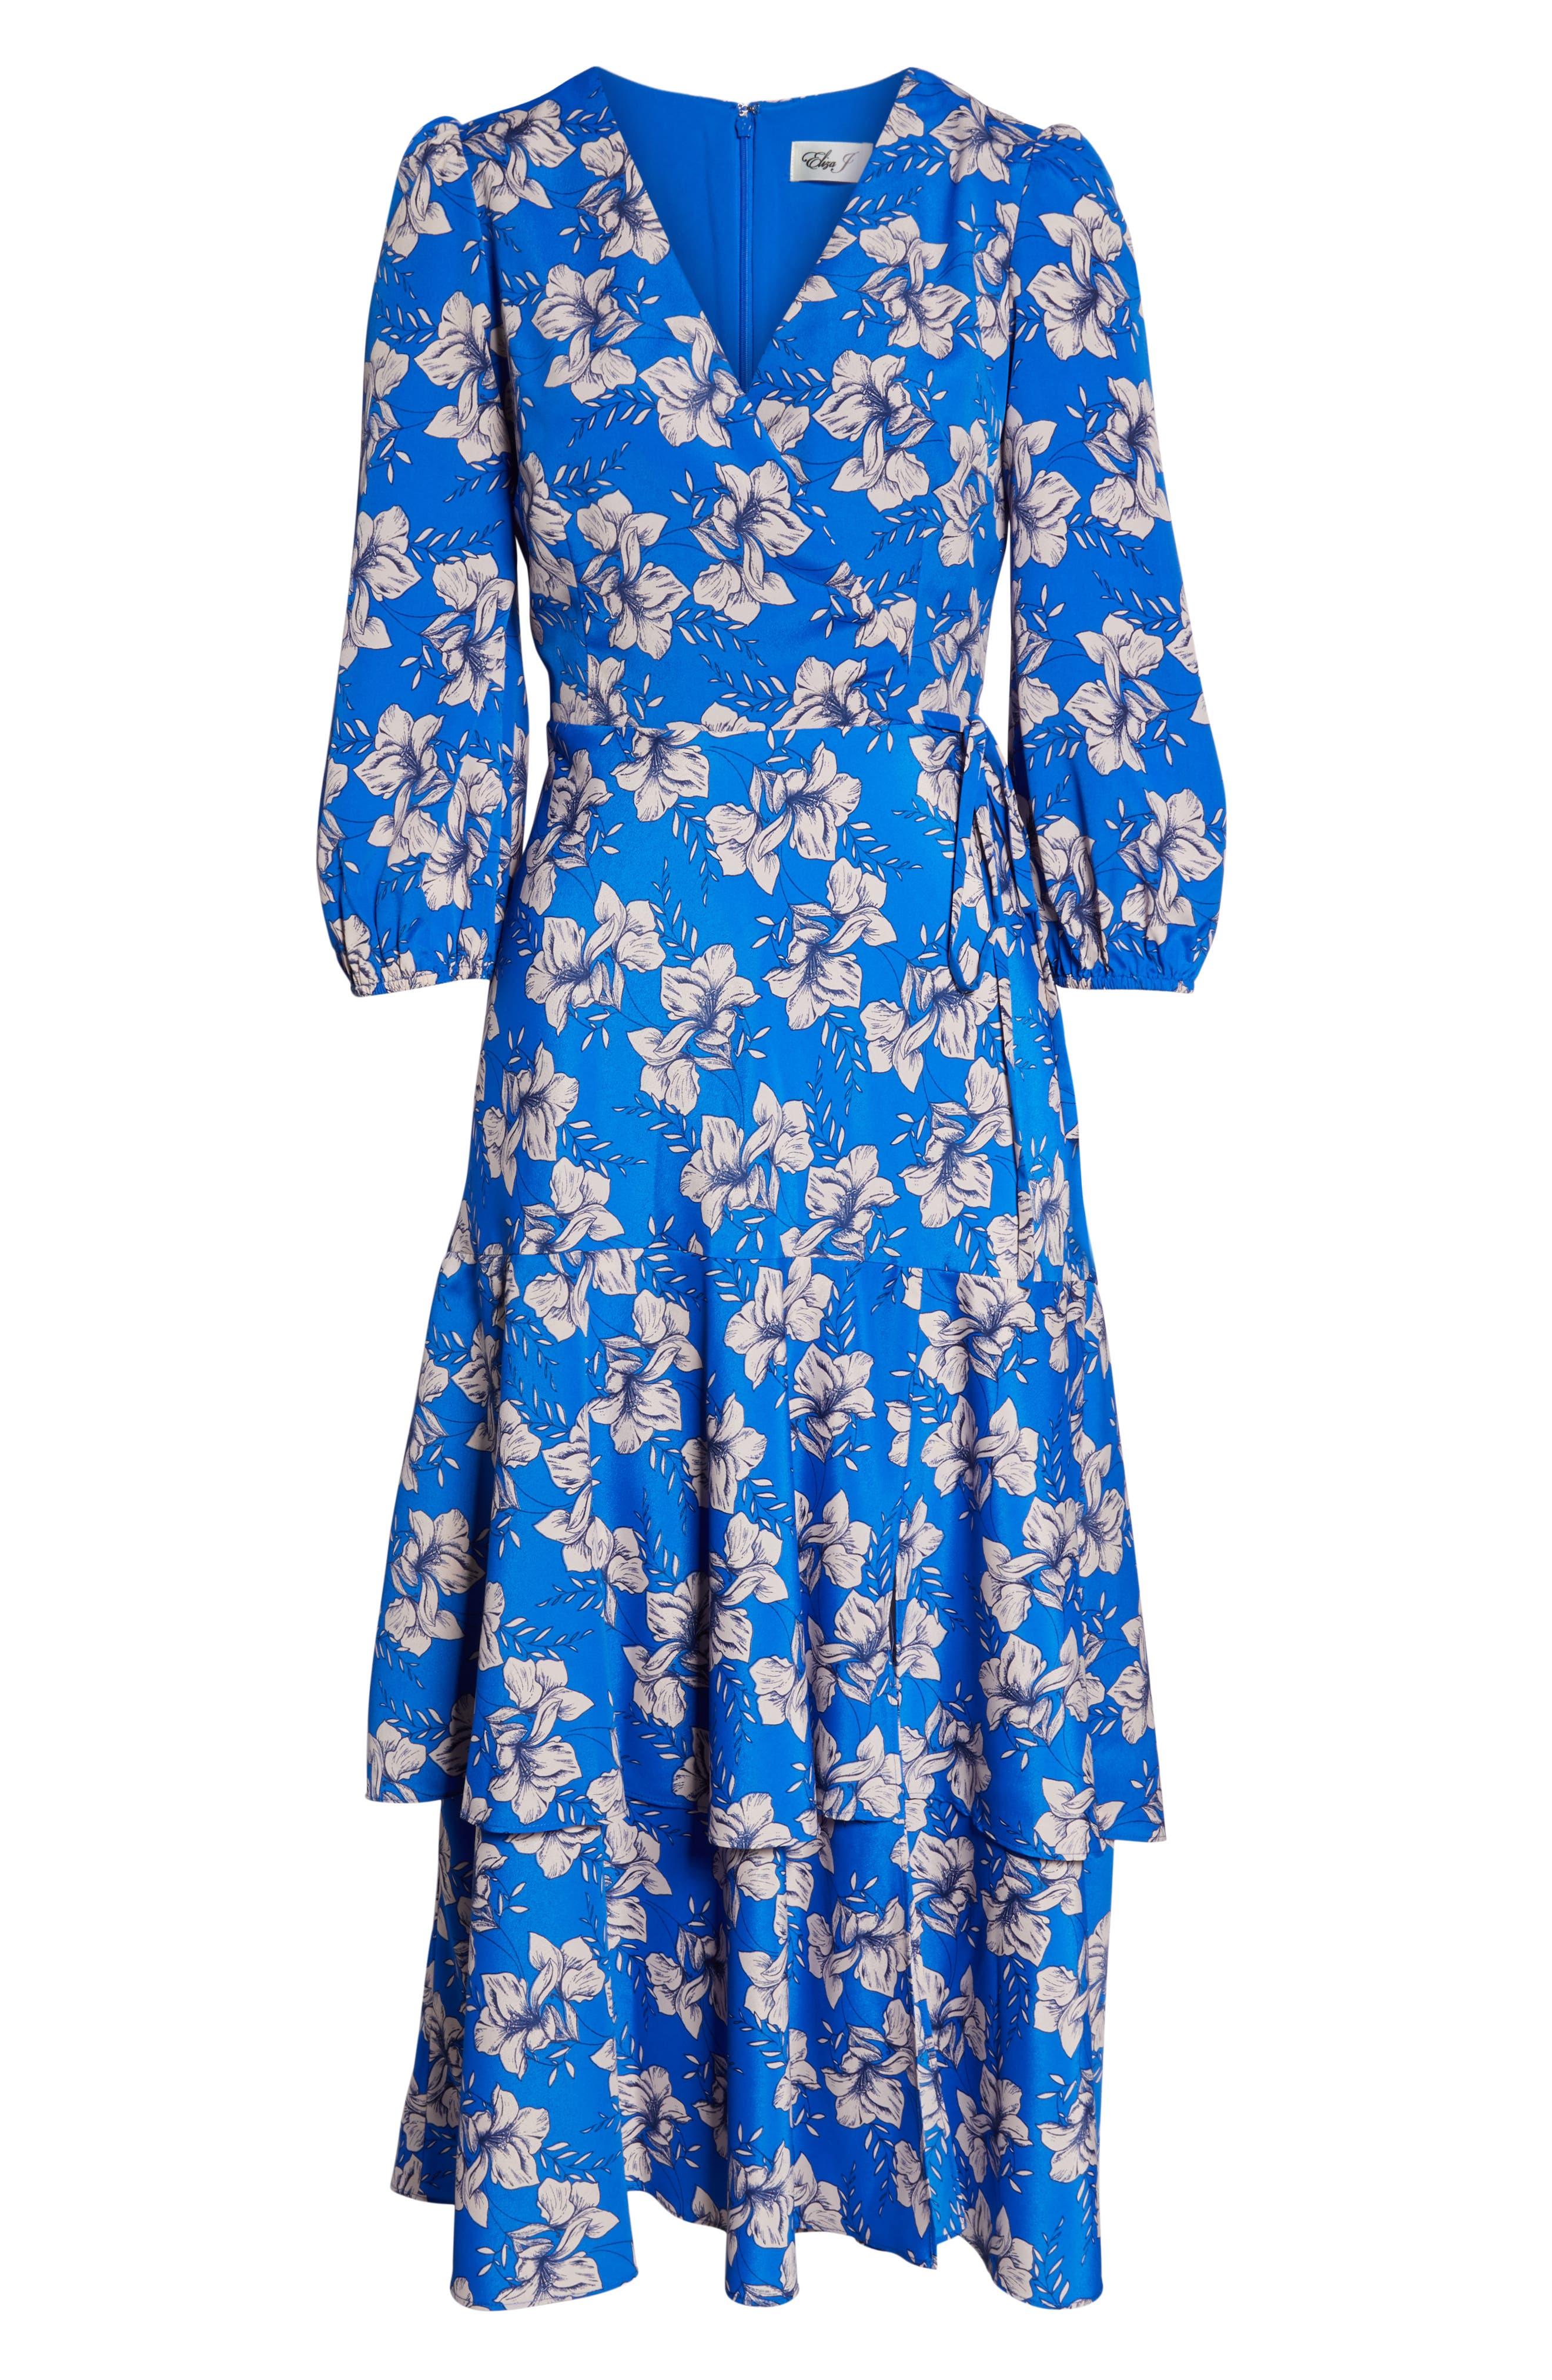 ELIZA J, Faux Wrap Maxi Dress, Alternate thumbnail 7, color, BLUE